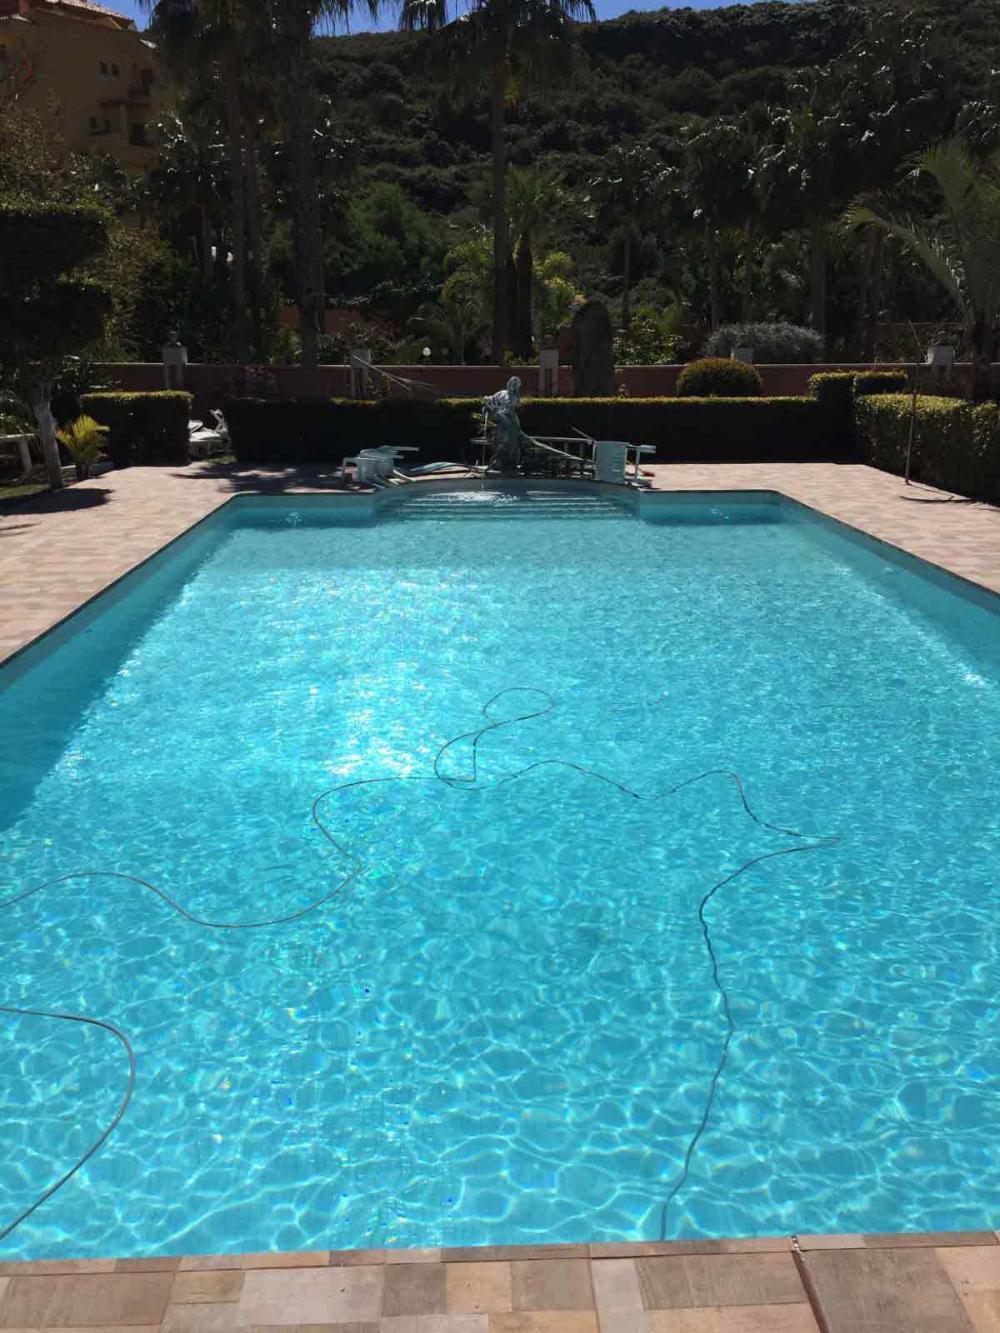 Precio piscina hormigon simple pileta natacion hormigon - Piscina prefabricada hormigon precio ...